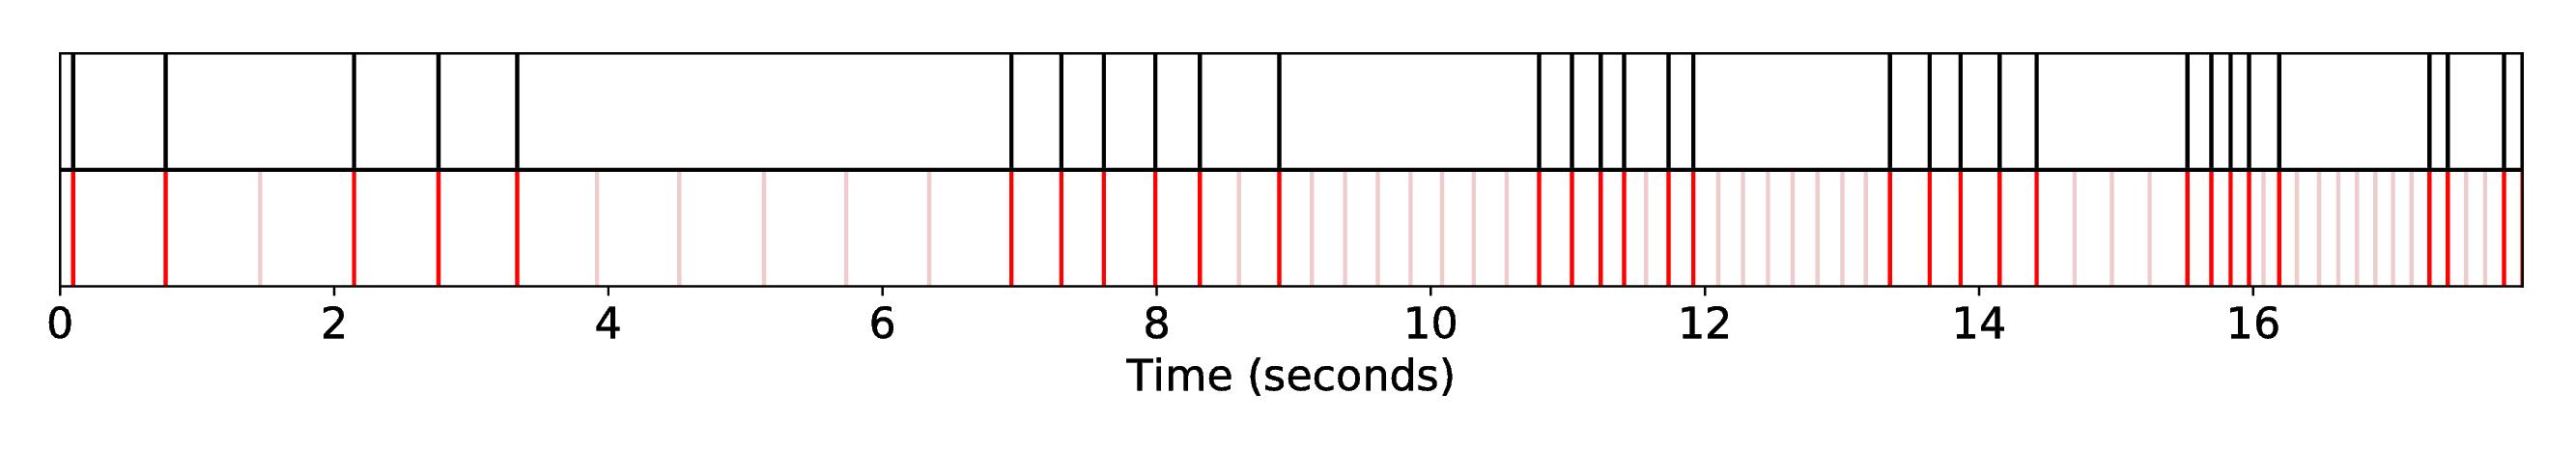 DP1_INT1_R-Syn-InIrGa__S-Silence__SequenceAlignment